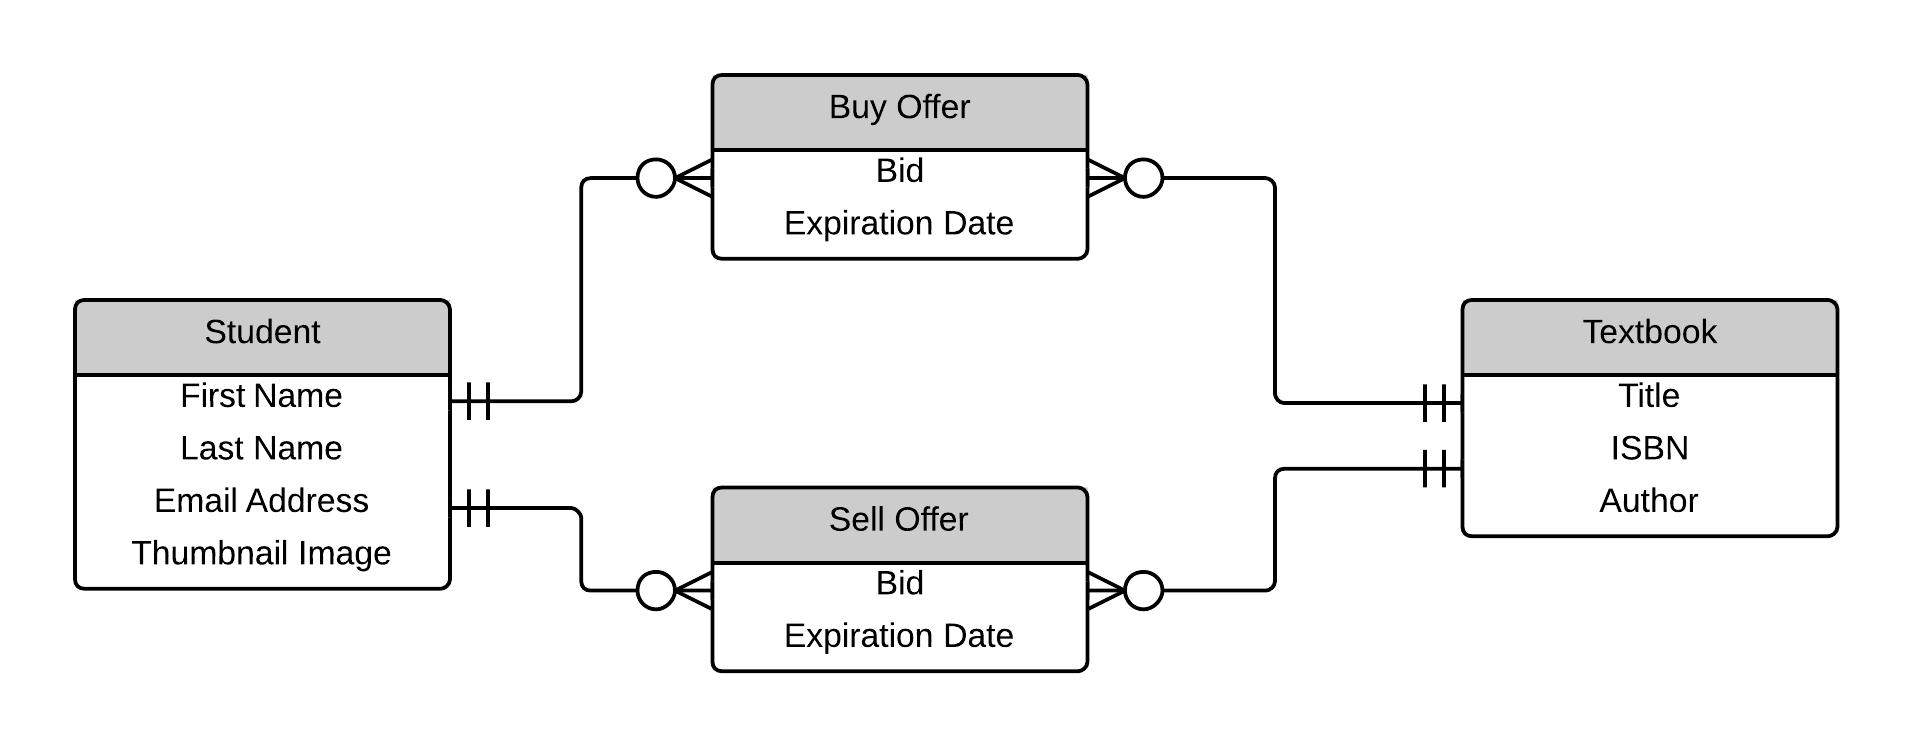 Textbook Mania Er Diagram Wod | Evan Komiyama inside One To Many Er Diagram Examples